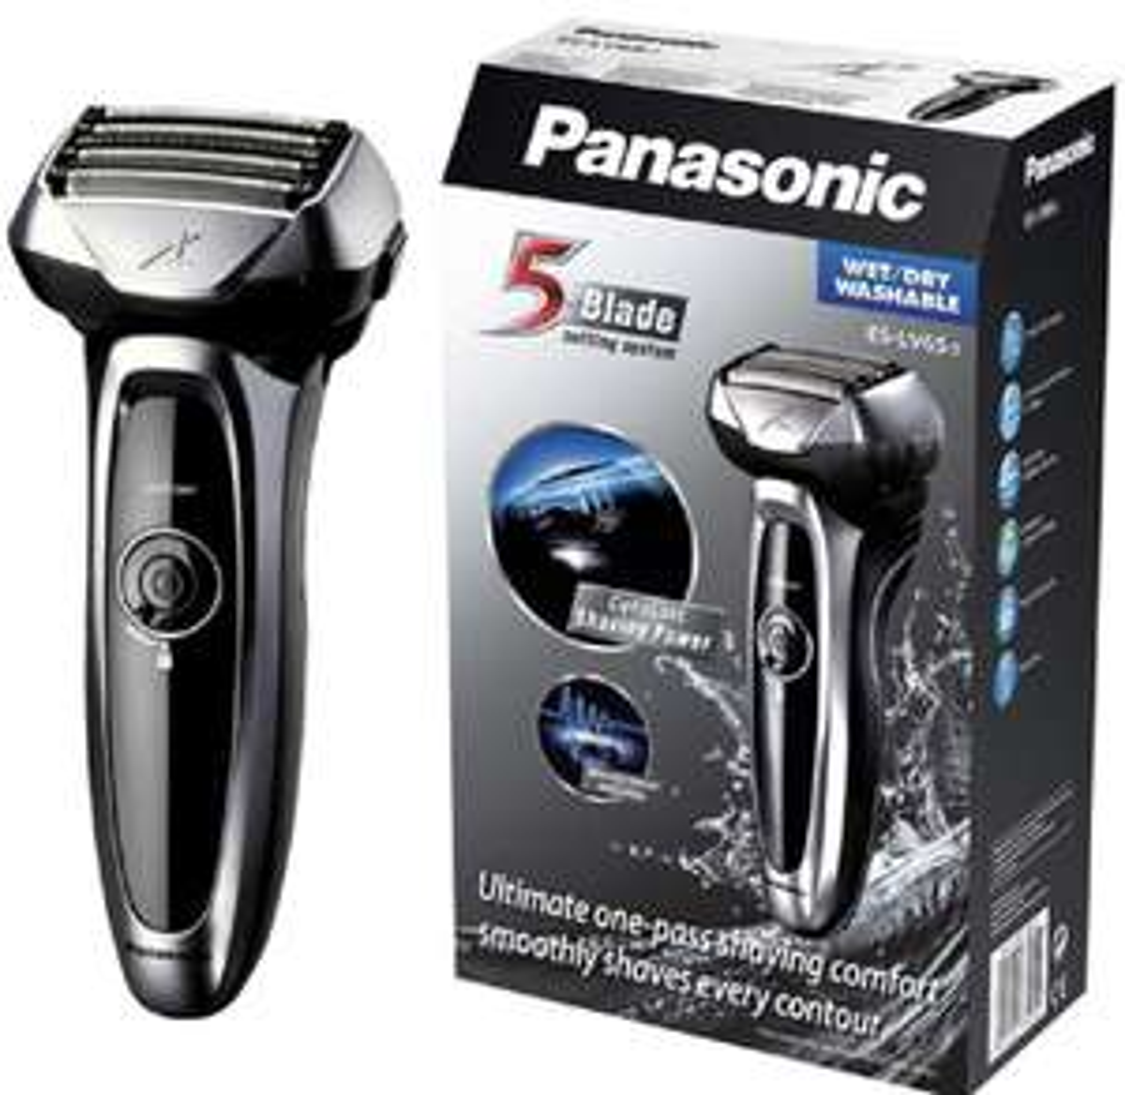 Panasonic ES-LV65-s Wet and Dry Electric 5-Blade Shaver - £79.99 (+£4.49 non-Prime) @ Amazon